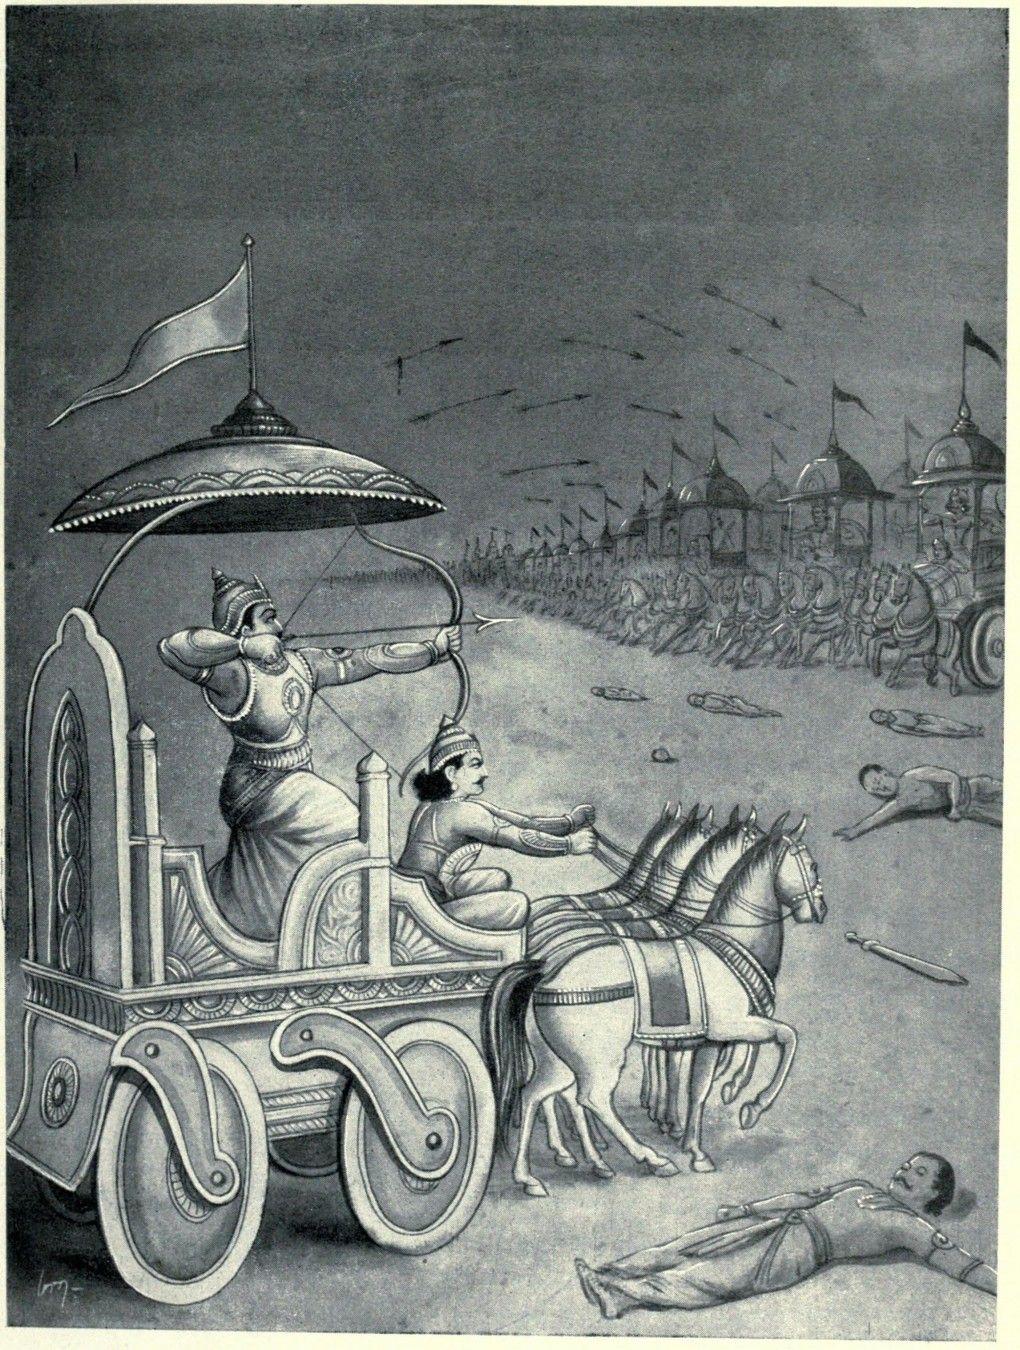 Satyaki Enters Kauravas Army And Battle With Soldiershttp://www.findmessages.com/satyaki-role-in-kurukshetra-war